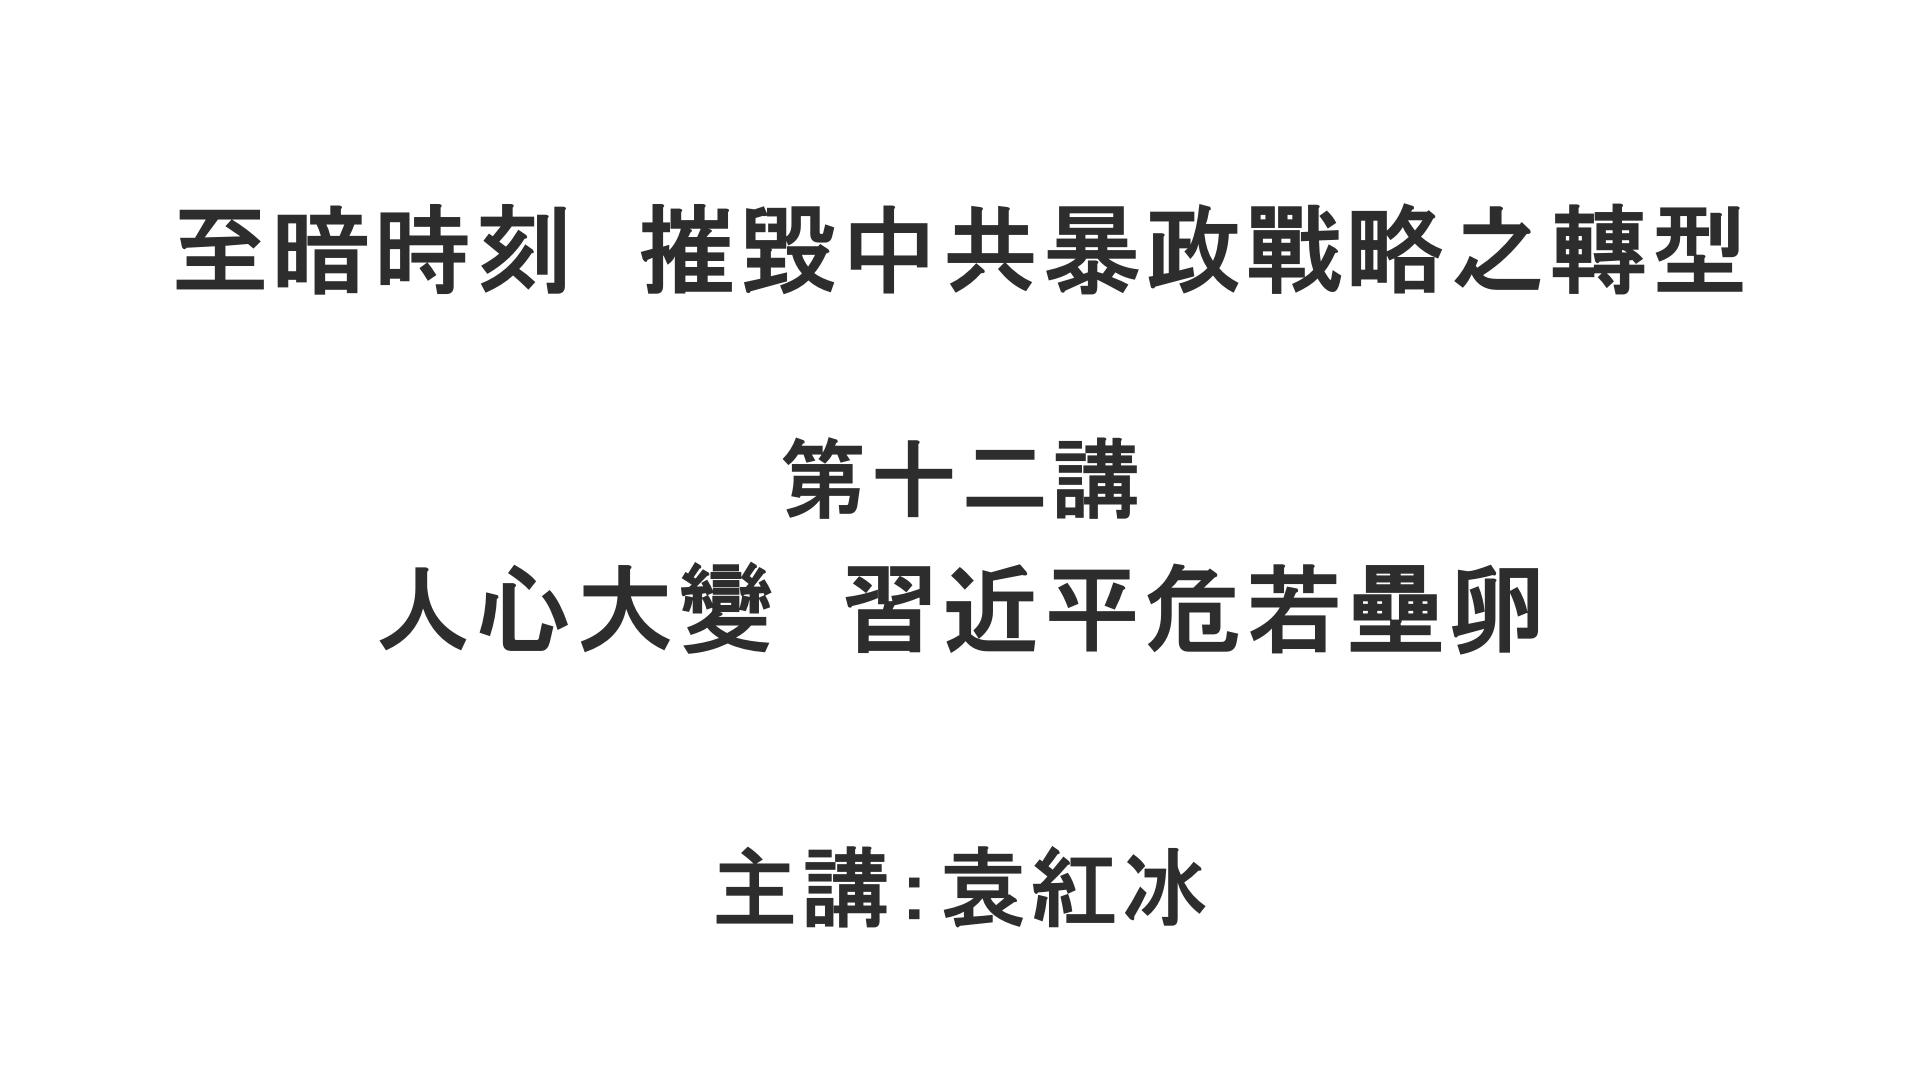 YuanHongBing-4-12-032021